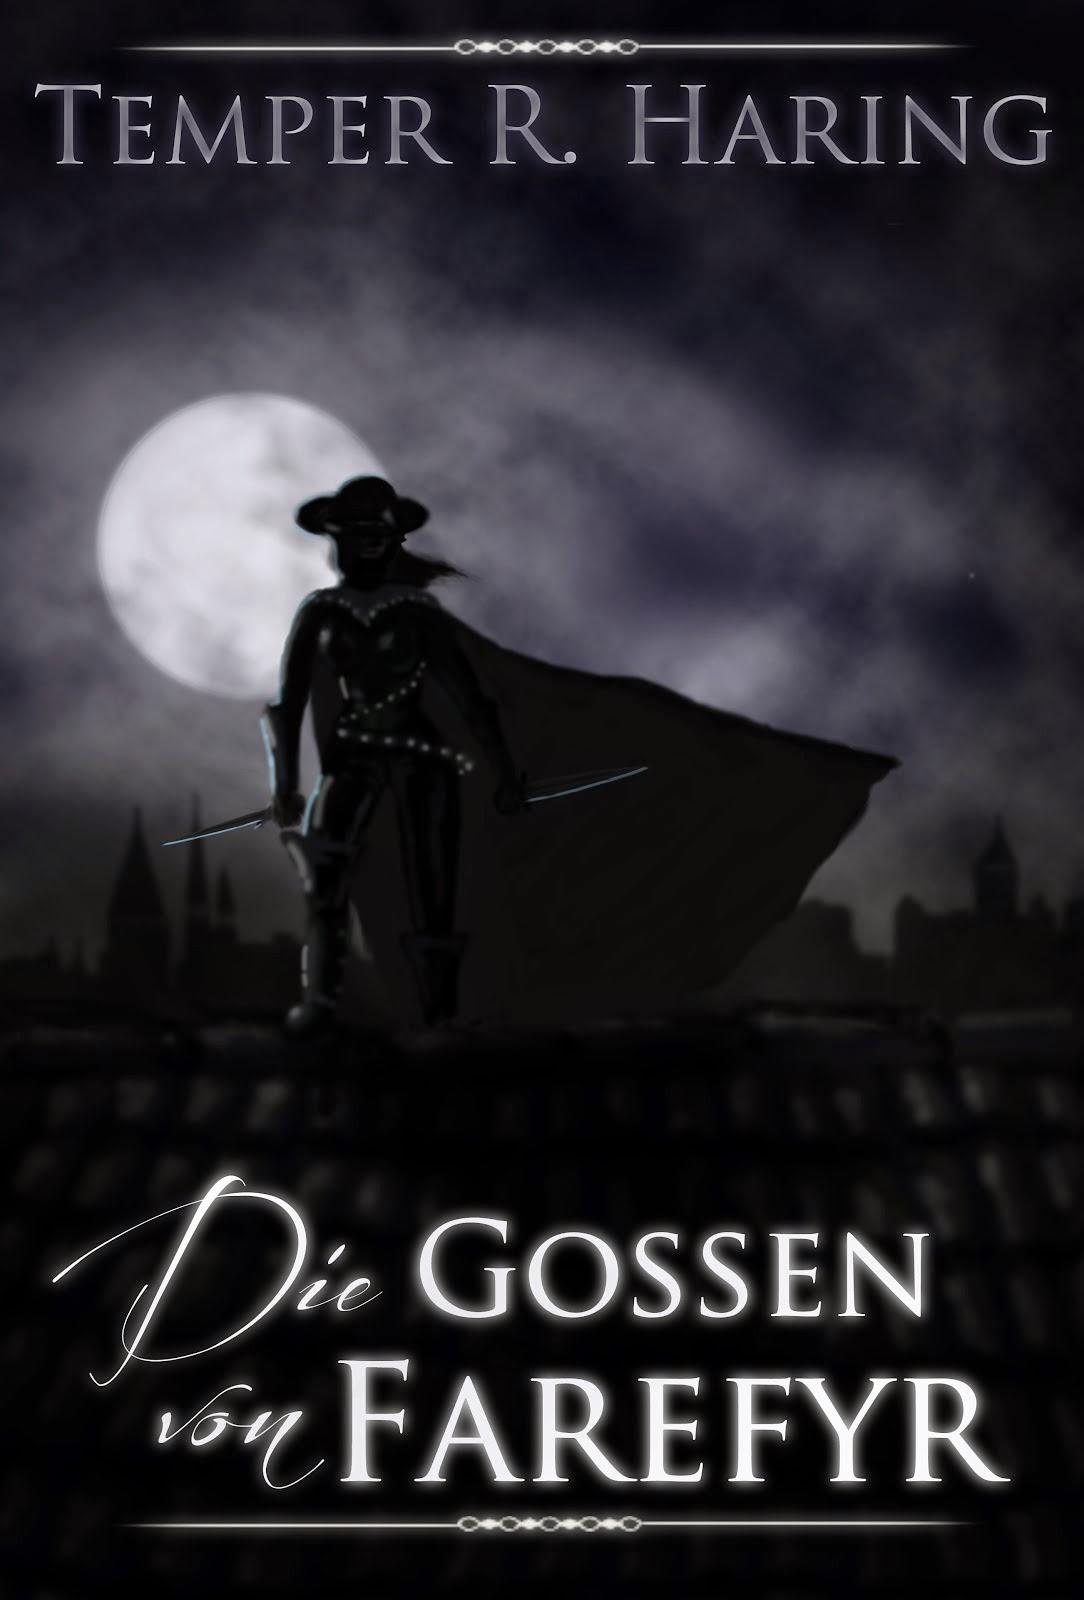 http://www.amazon.de/Die-Gossen-Farefyr-Temper-Haring-ebook/dp/B00EW93CBE/ref=pd_ecc_rvi_1